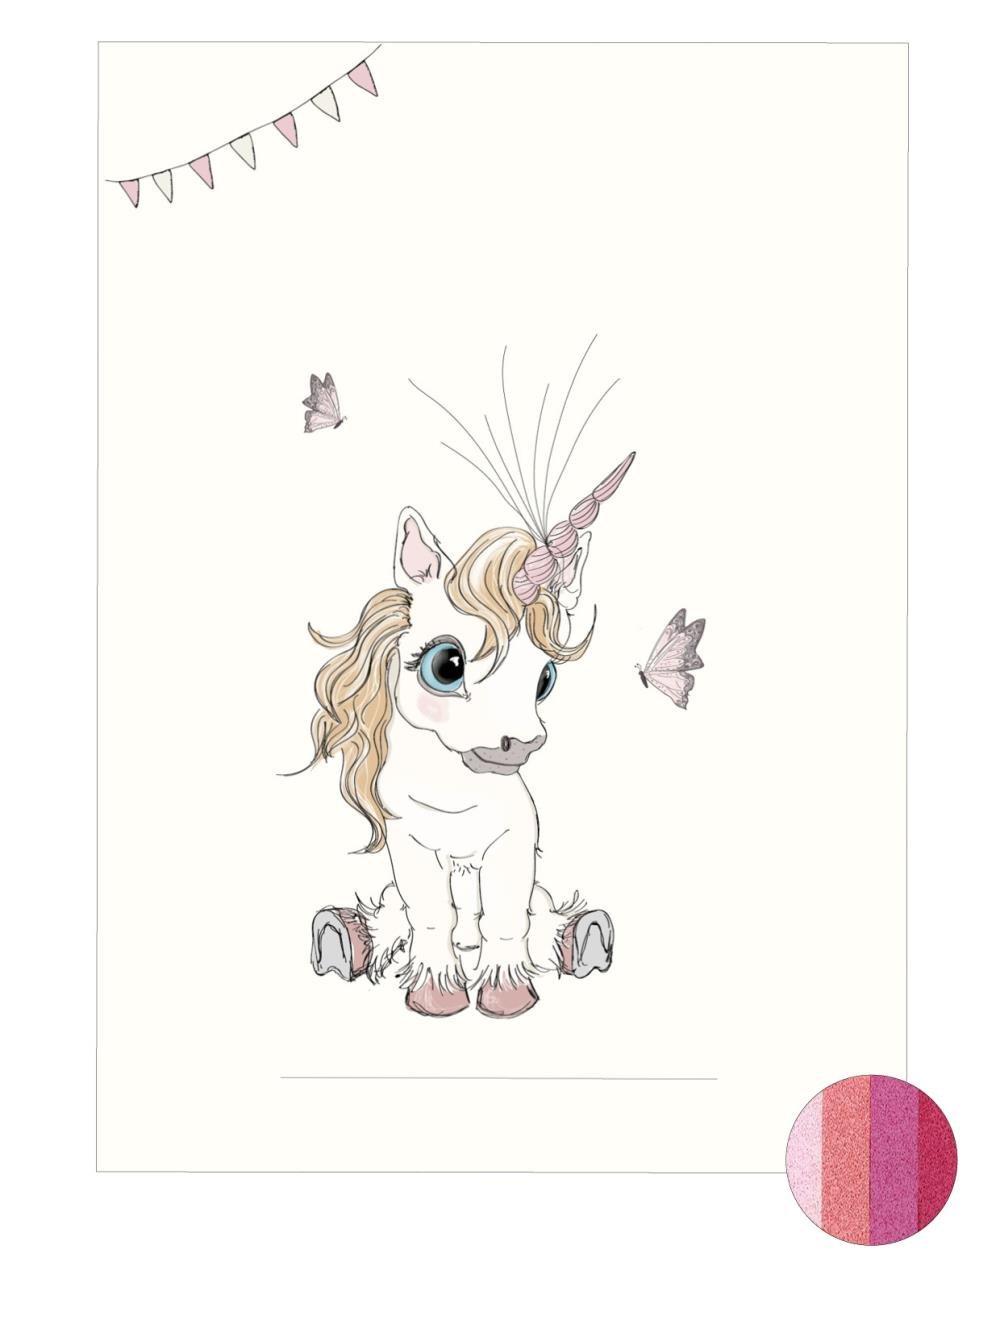 Plakat A3 - Baby unicorn Fluffy pink - Fingerprint